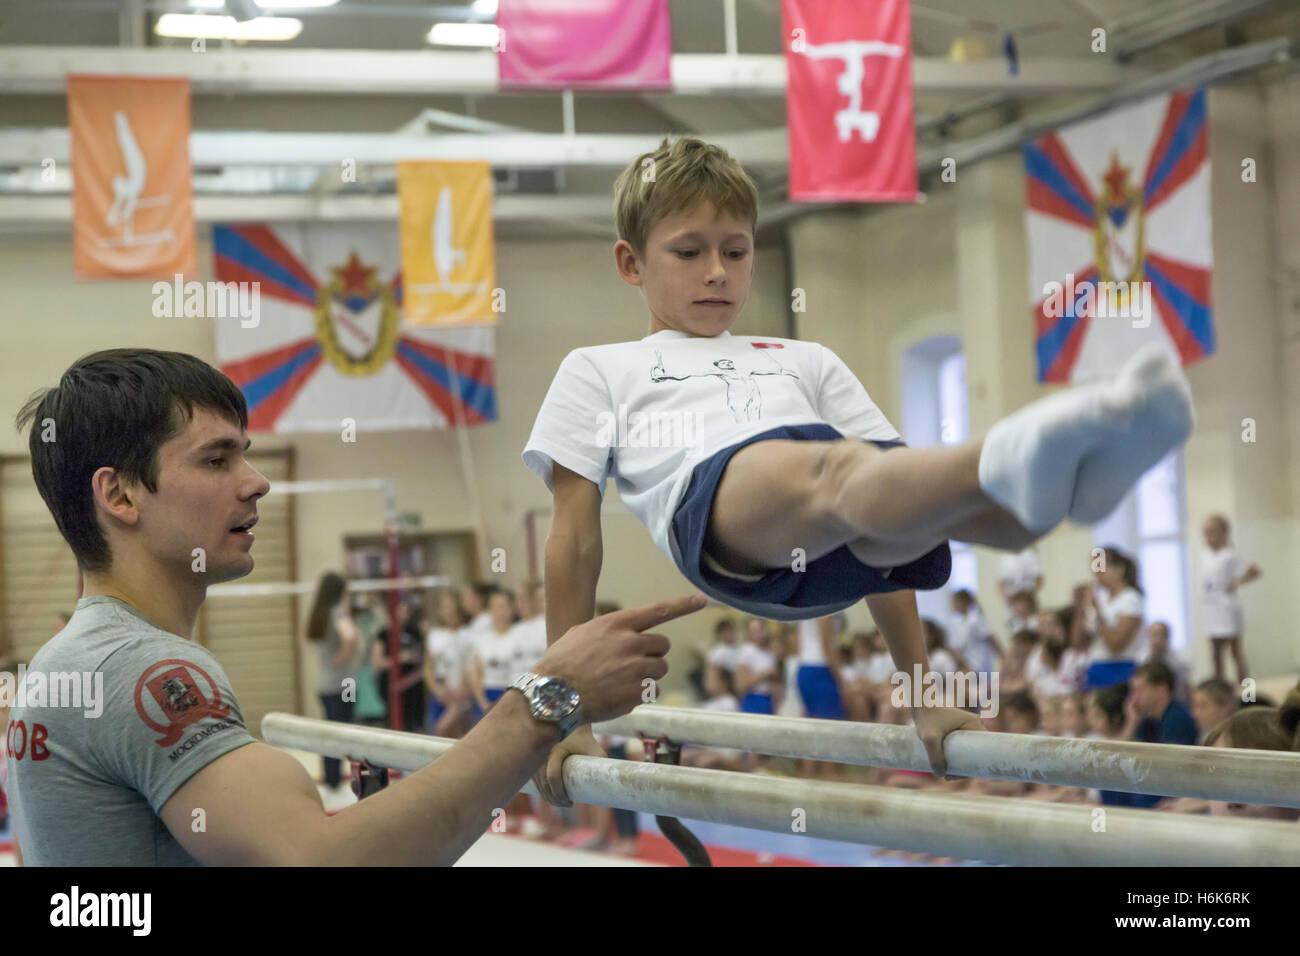 Ginnasta russo Nikolai Kuksenkov (sinistra) partecipa a una master class di ginnastica per bambini Immagini Stock